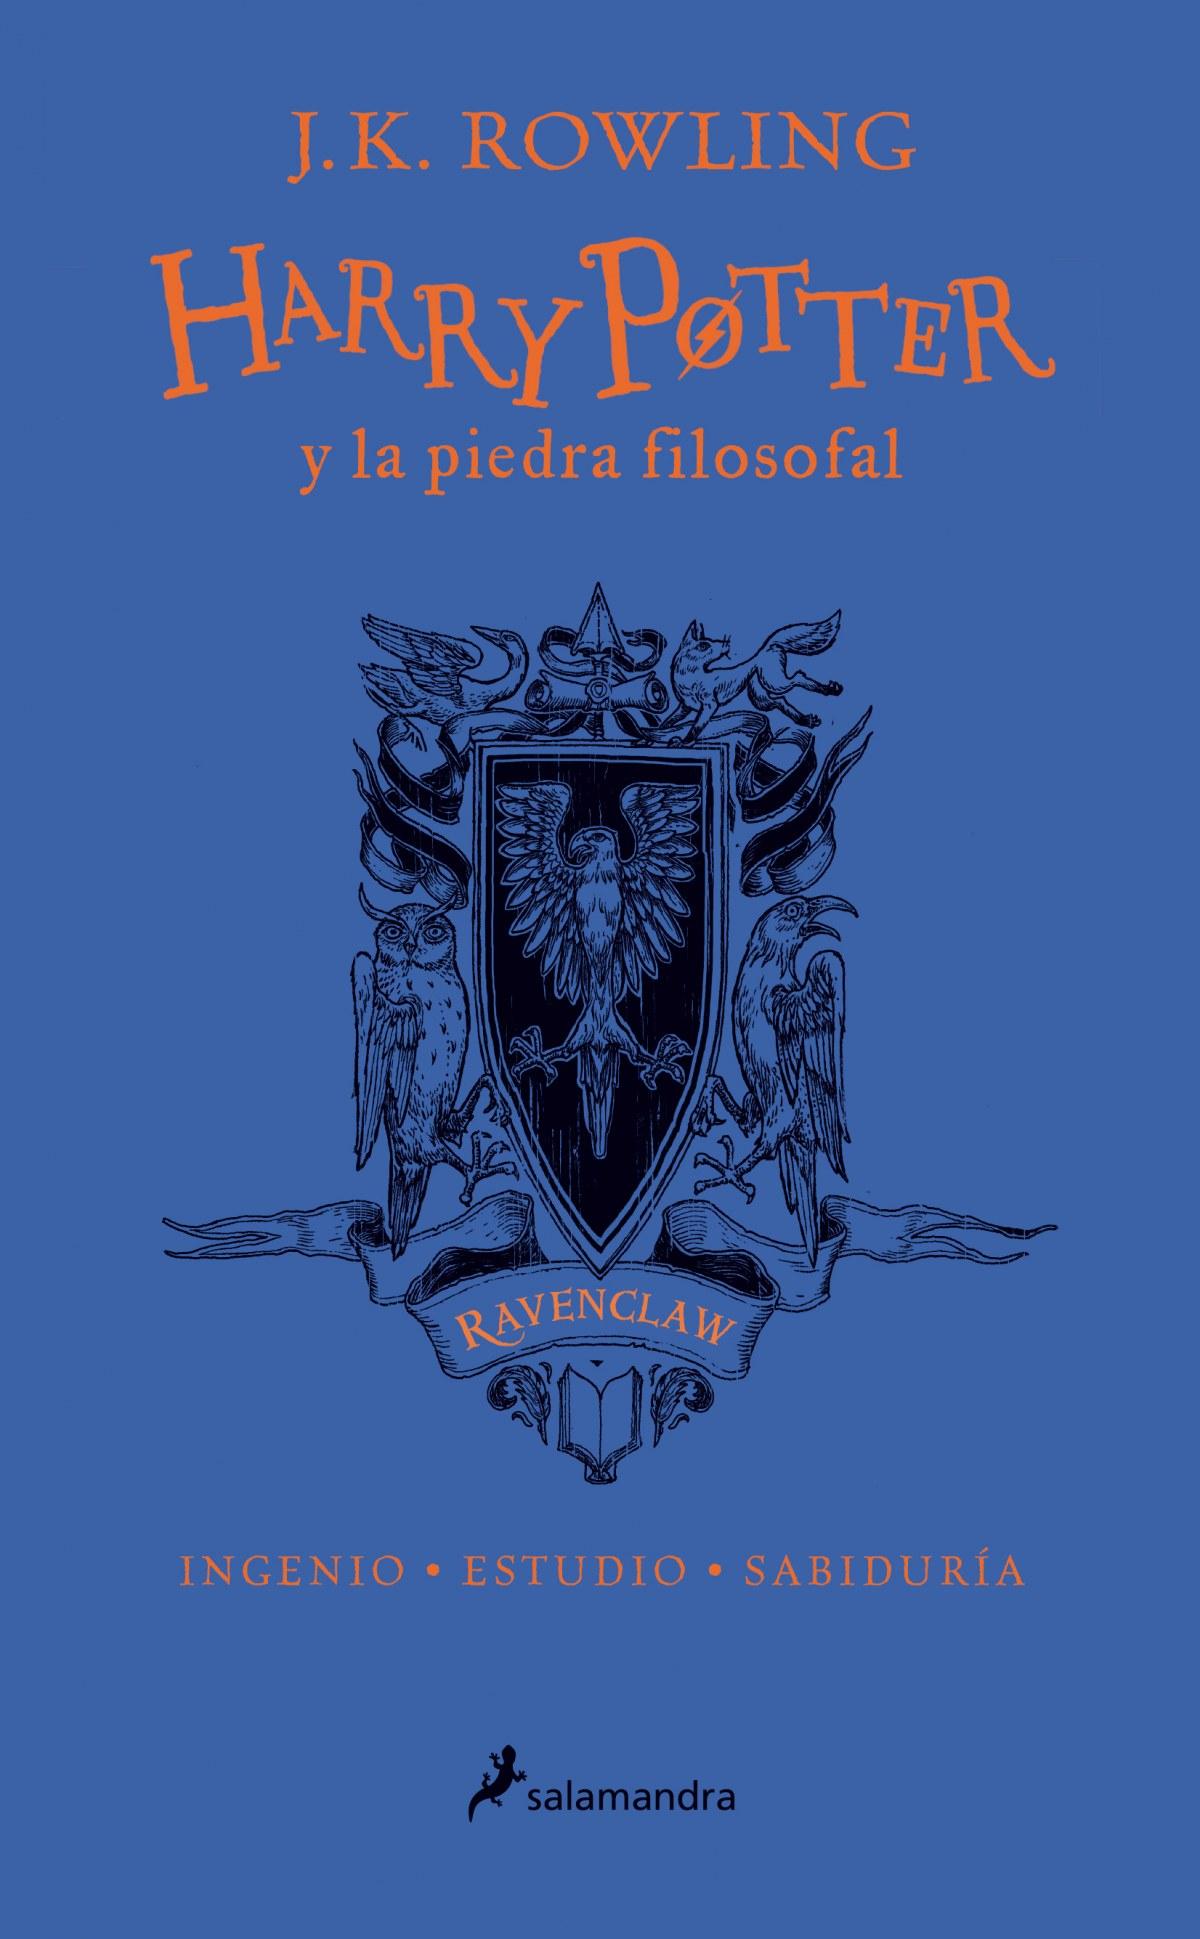 RAVEBCLAW HARRY POTTER Y LA PIEDRA FILOSOFAL 9788498388916